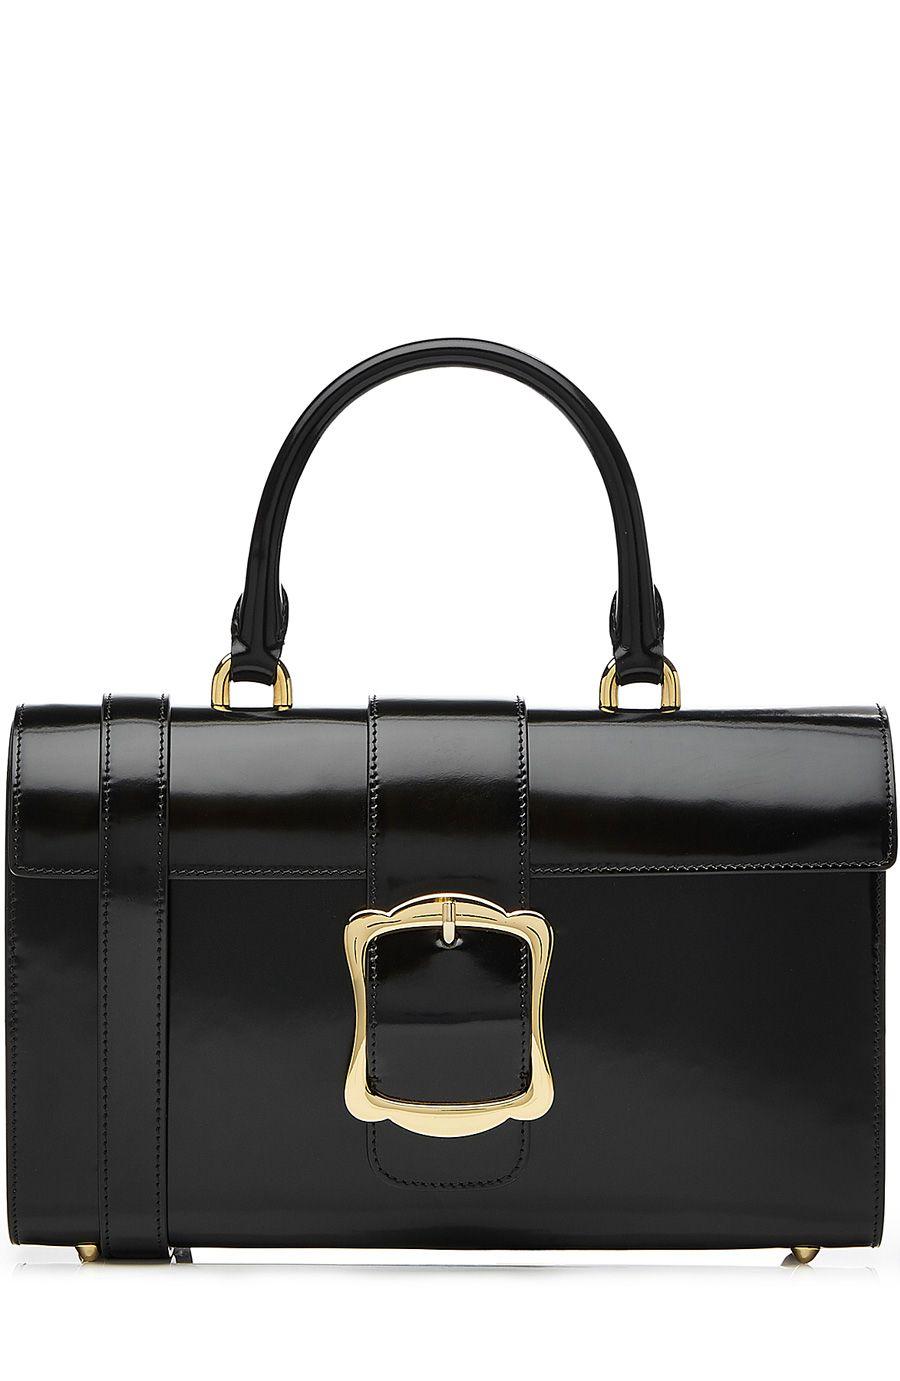 Simone Rocha Patent Leather Shoulder Bag Simonerocha Bags Hand